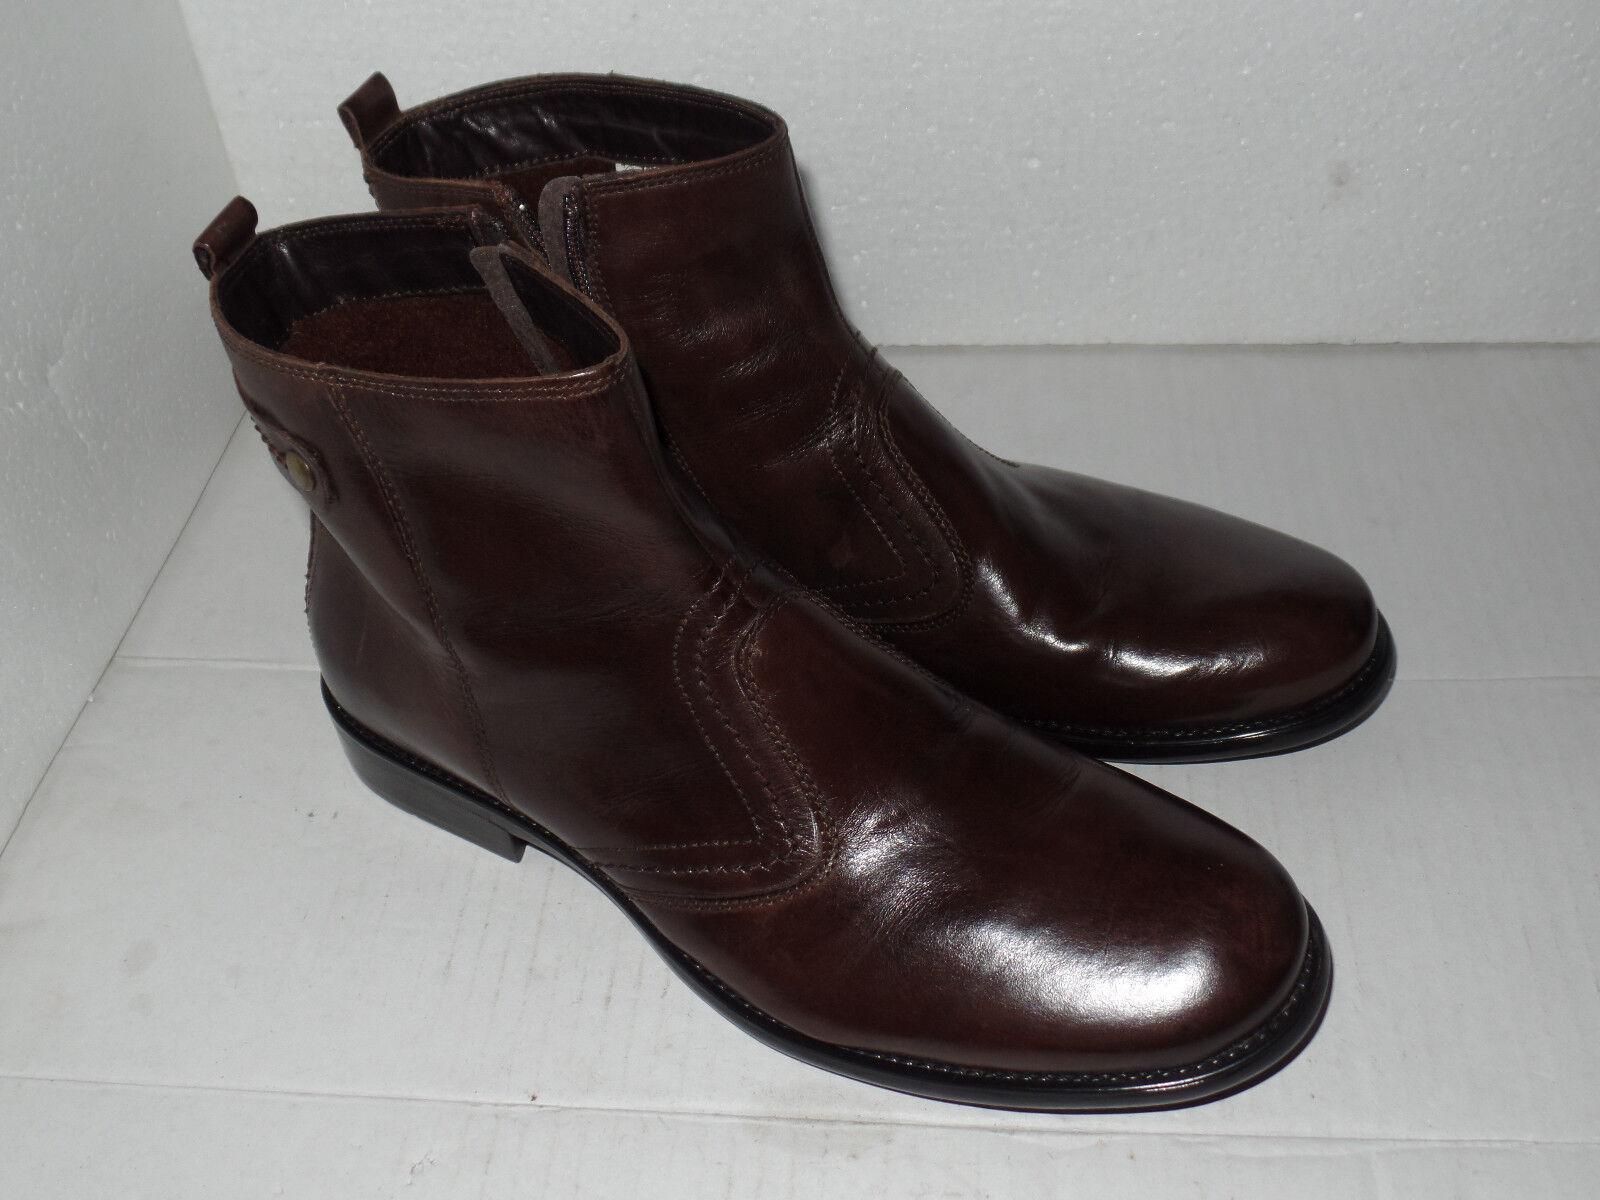 Claudio Conti Stiefel, Herren Echtleder-Stiefelette, Boots, Schuhe Gr. 42